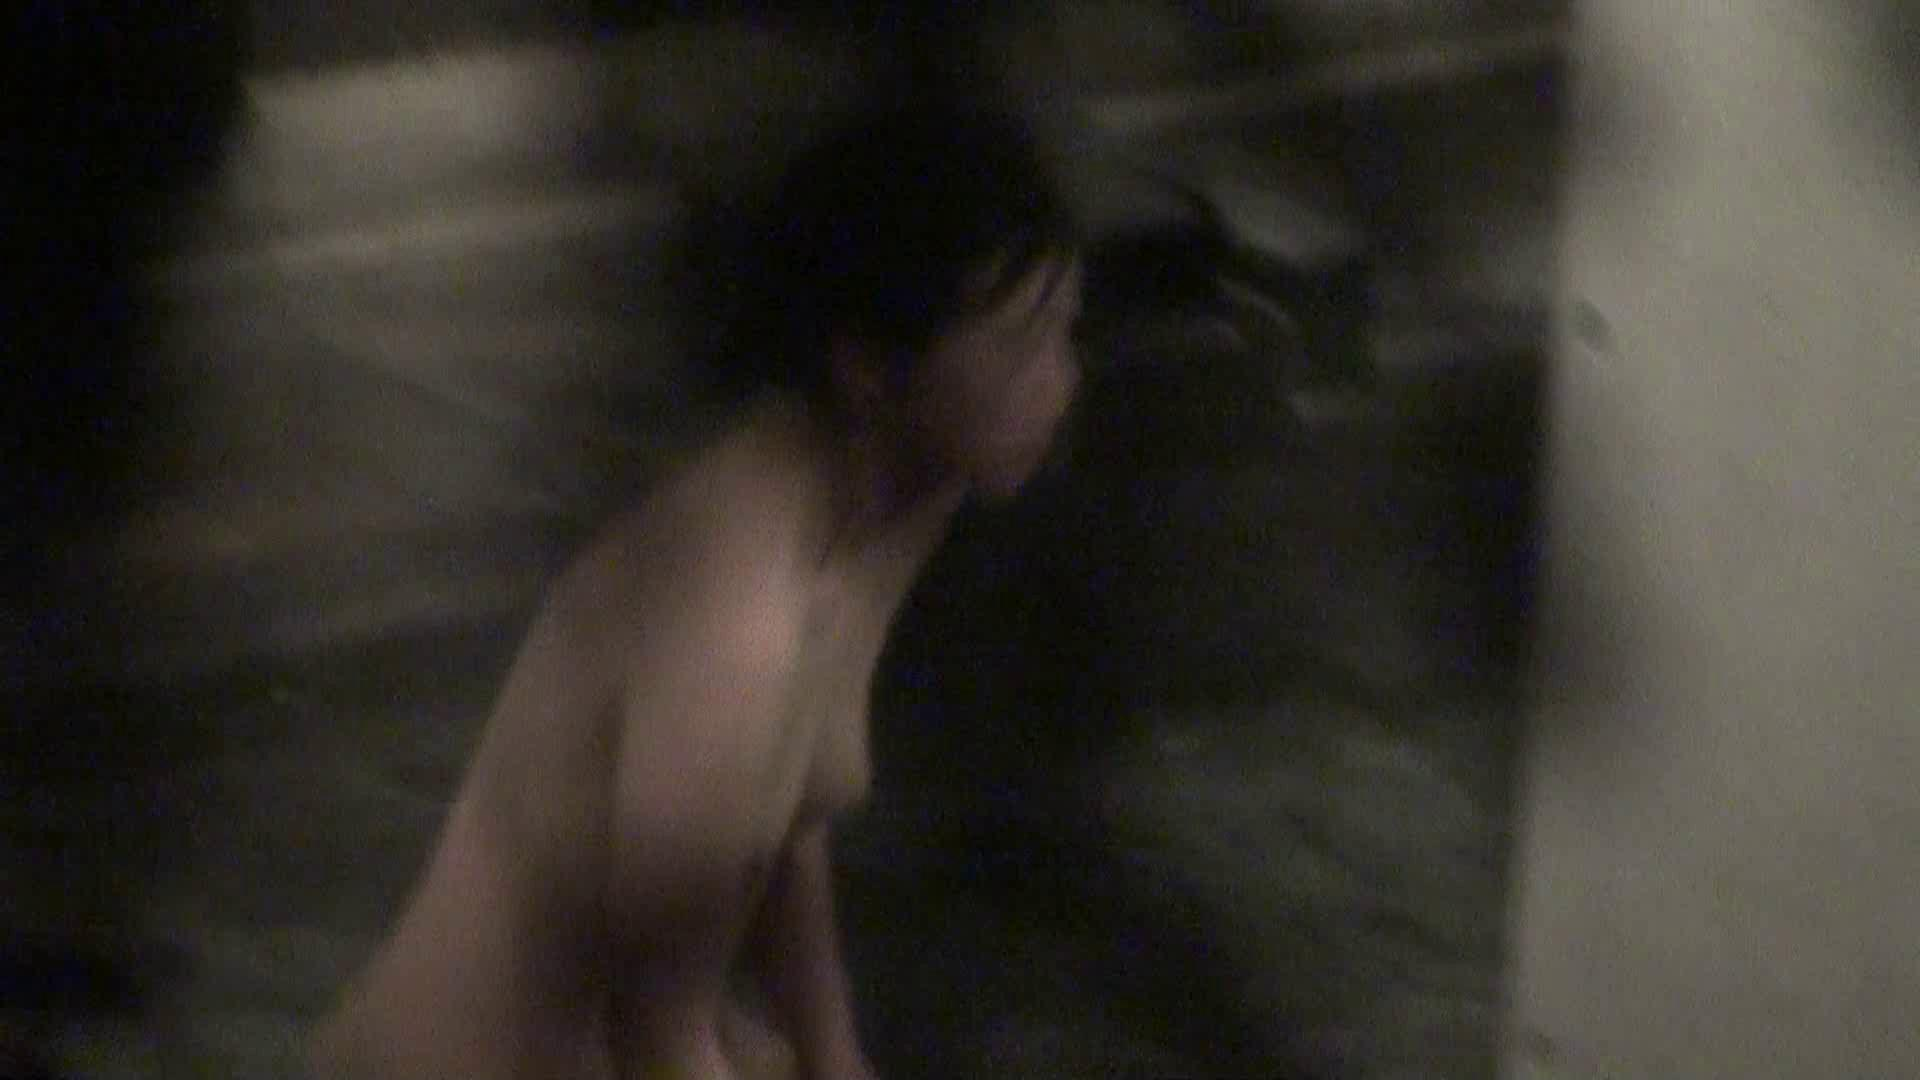 Aquaな露天風呂Vol.393 綺麗なOLたち  91枚 87